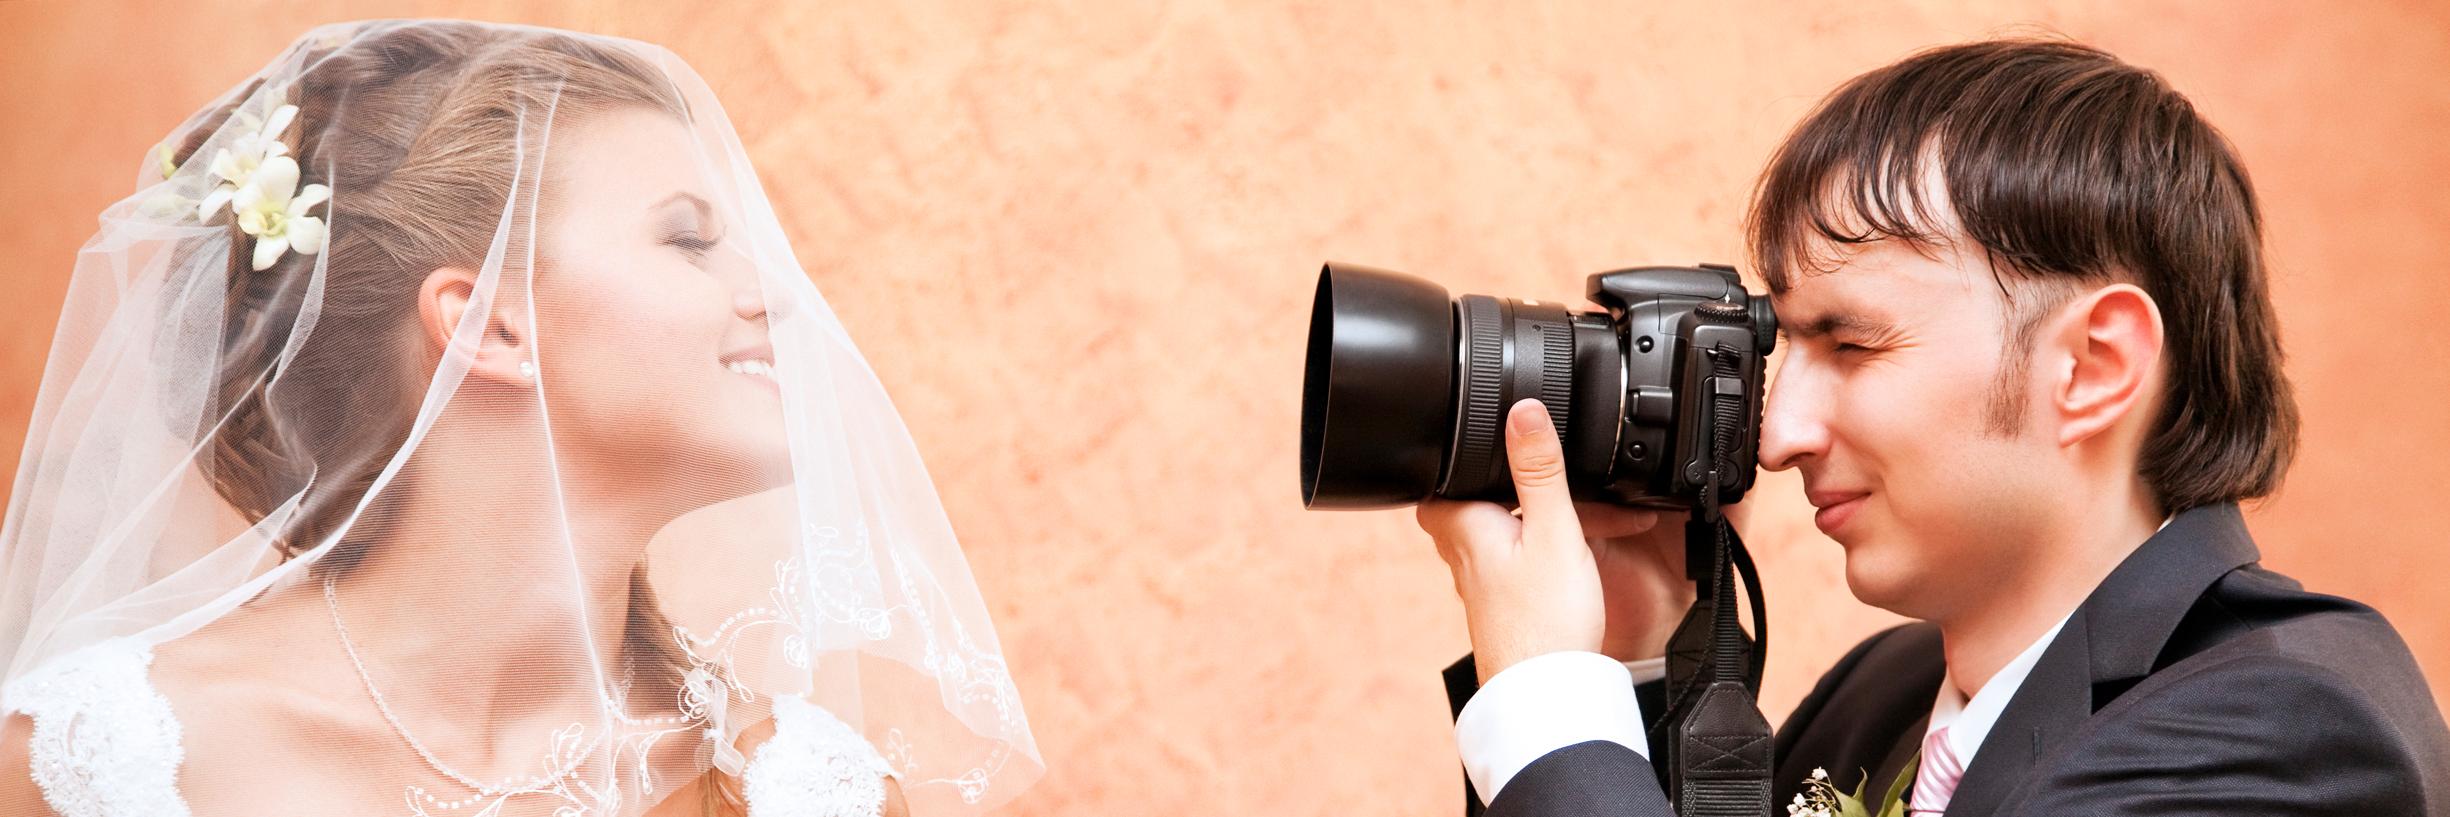 10 kjappe tips for bryllupsfotografering